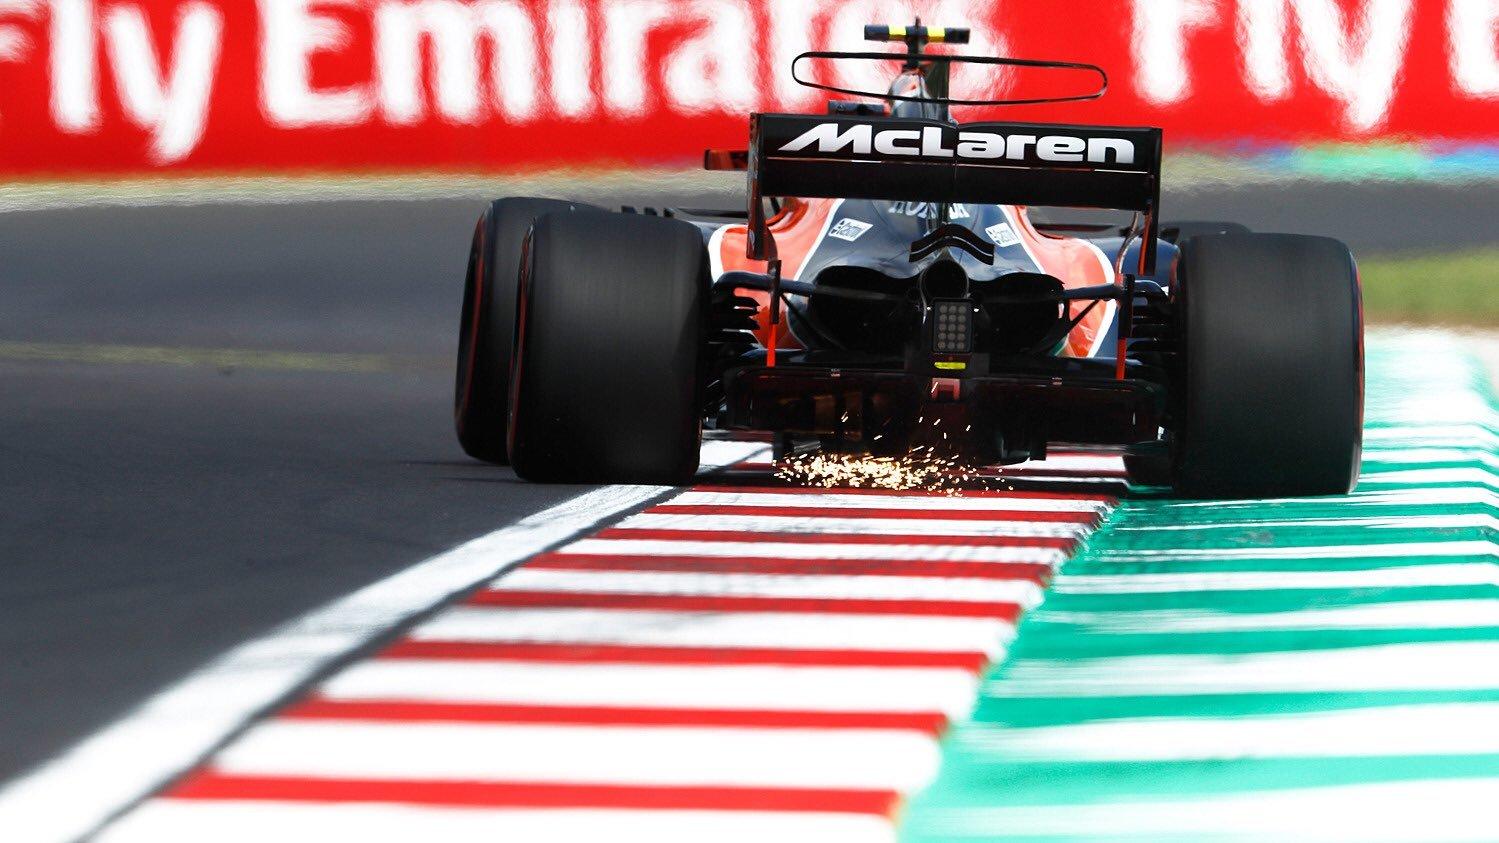 McLaren Hungaroring 2017